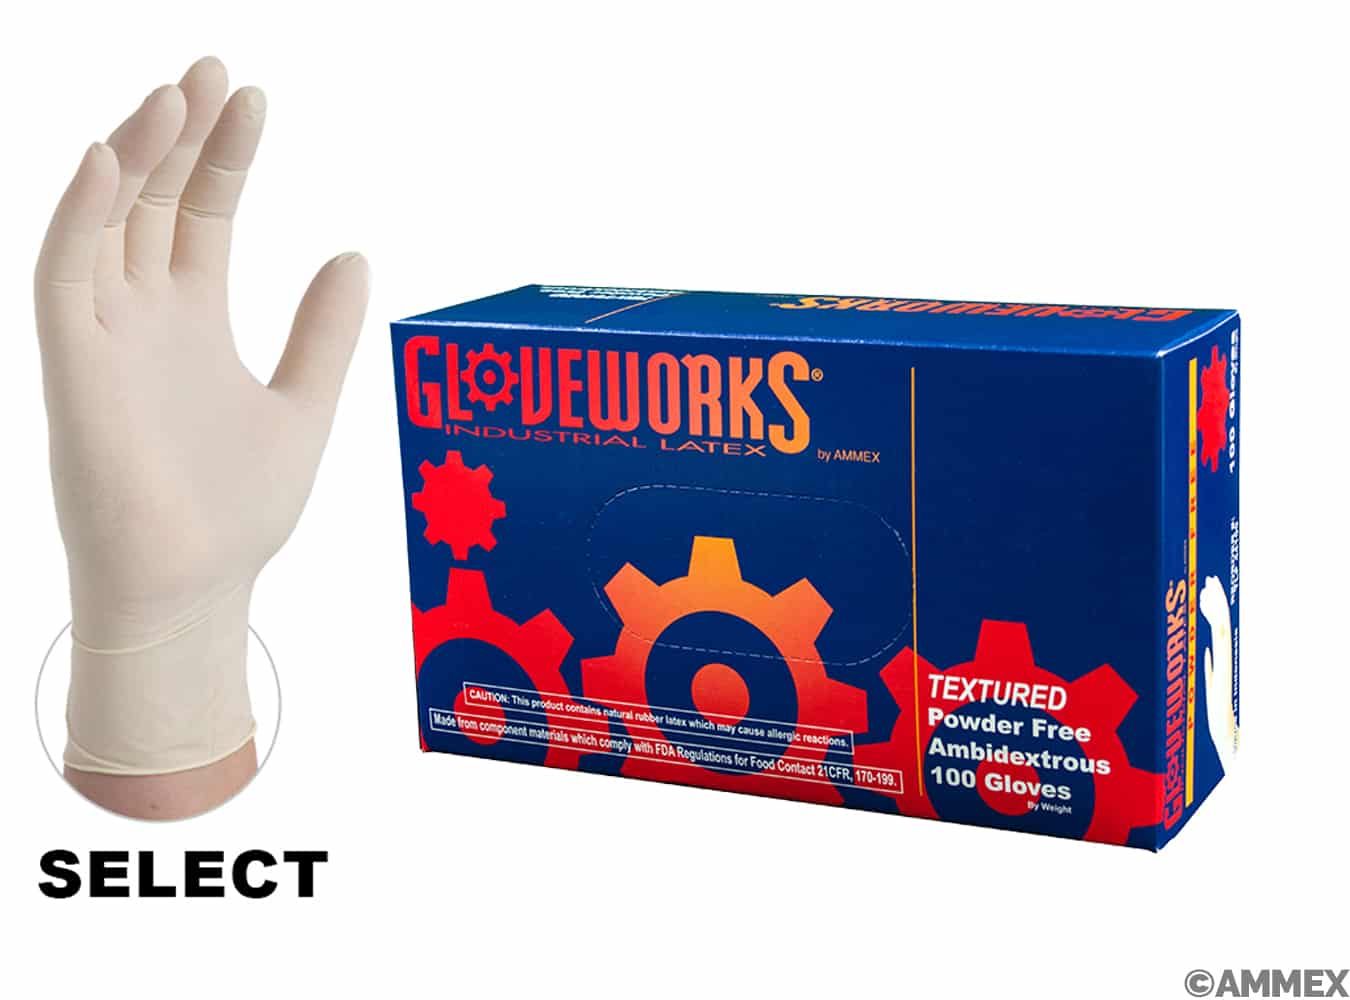 Gloveworks hd latex pf industrial gloves